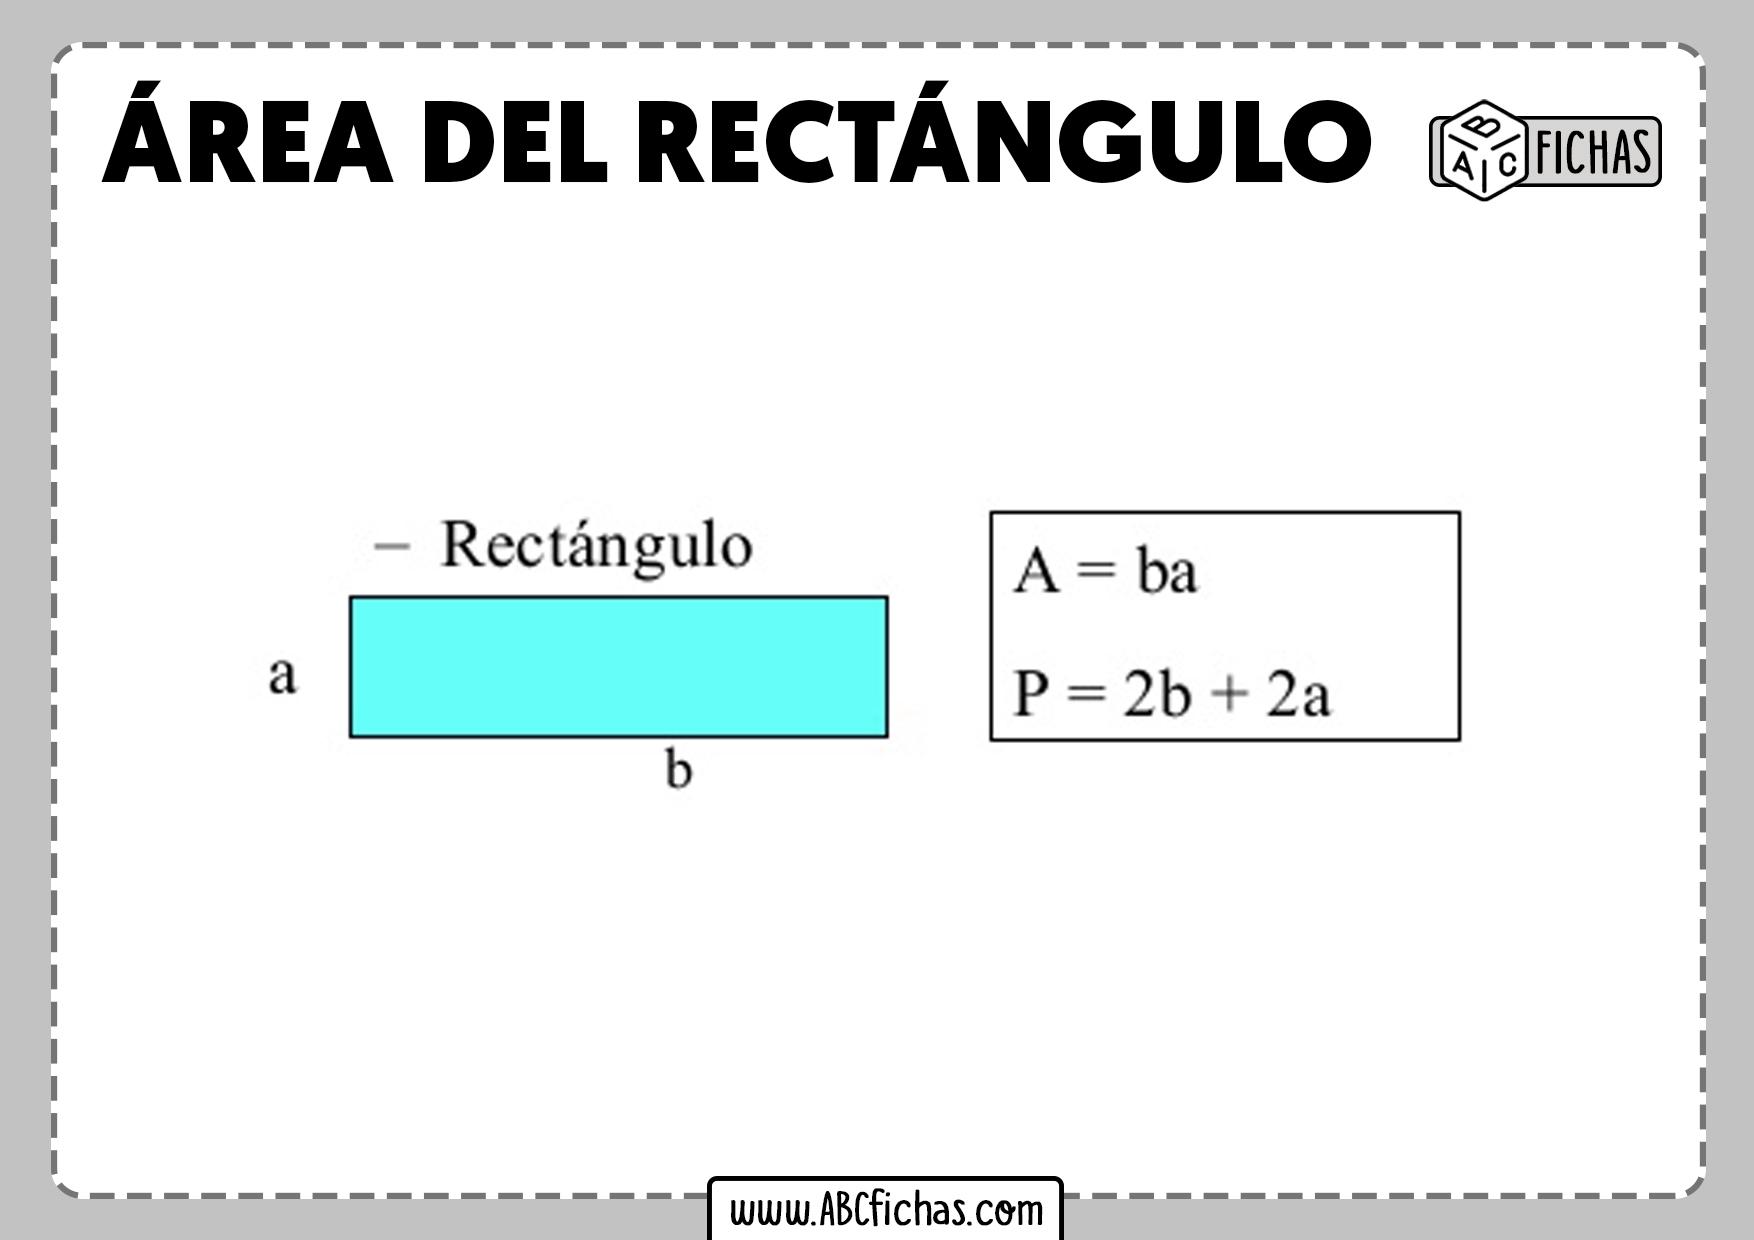 Calcular area del rectangulo